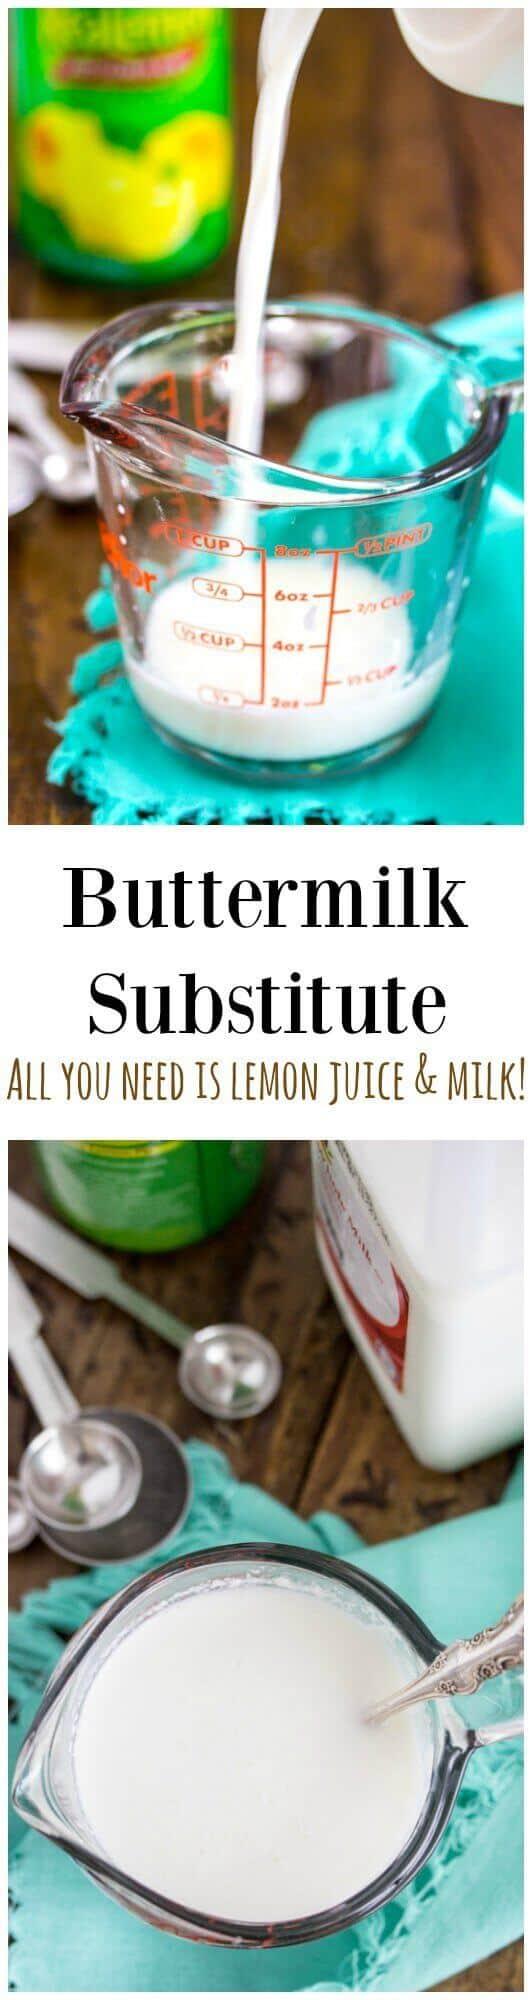 easiest-ever-buttermilk-substitute-all-you-need-is-milk-and-lemon-juice-or-vinegar